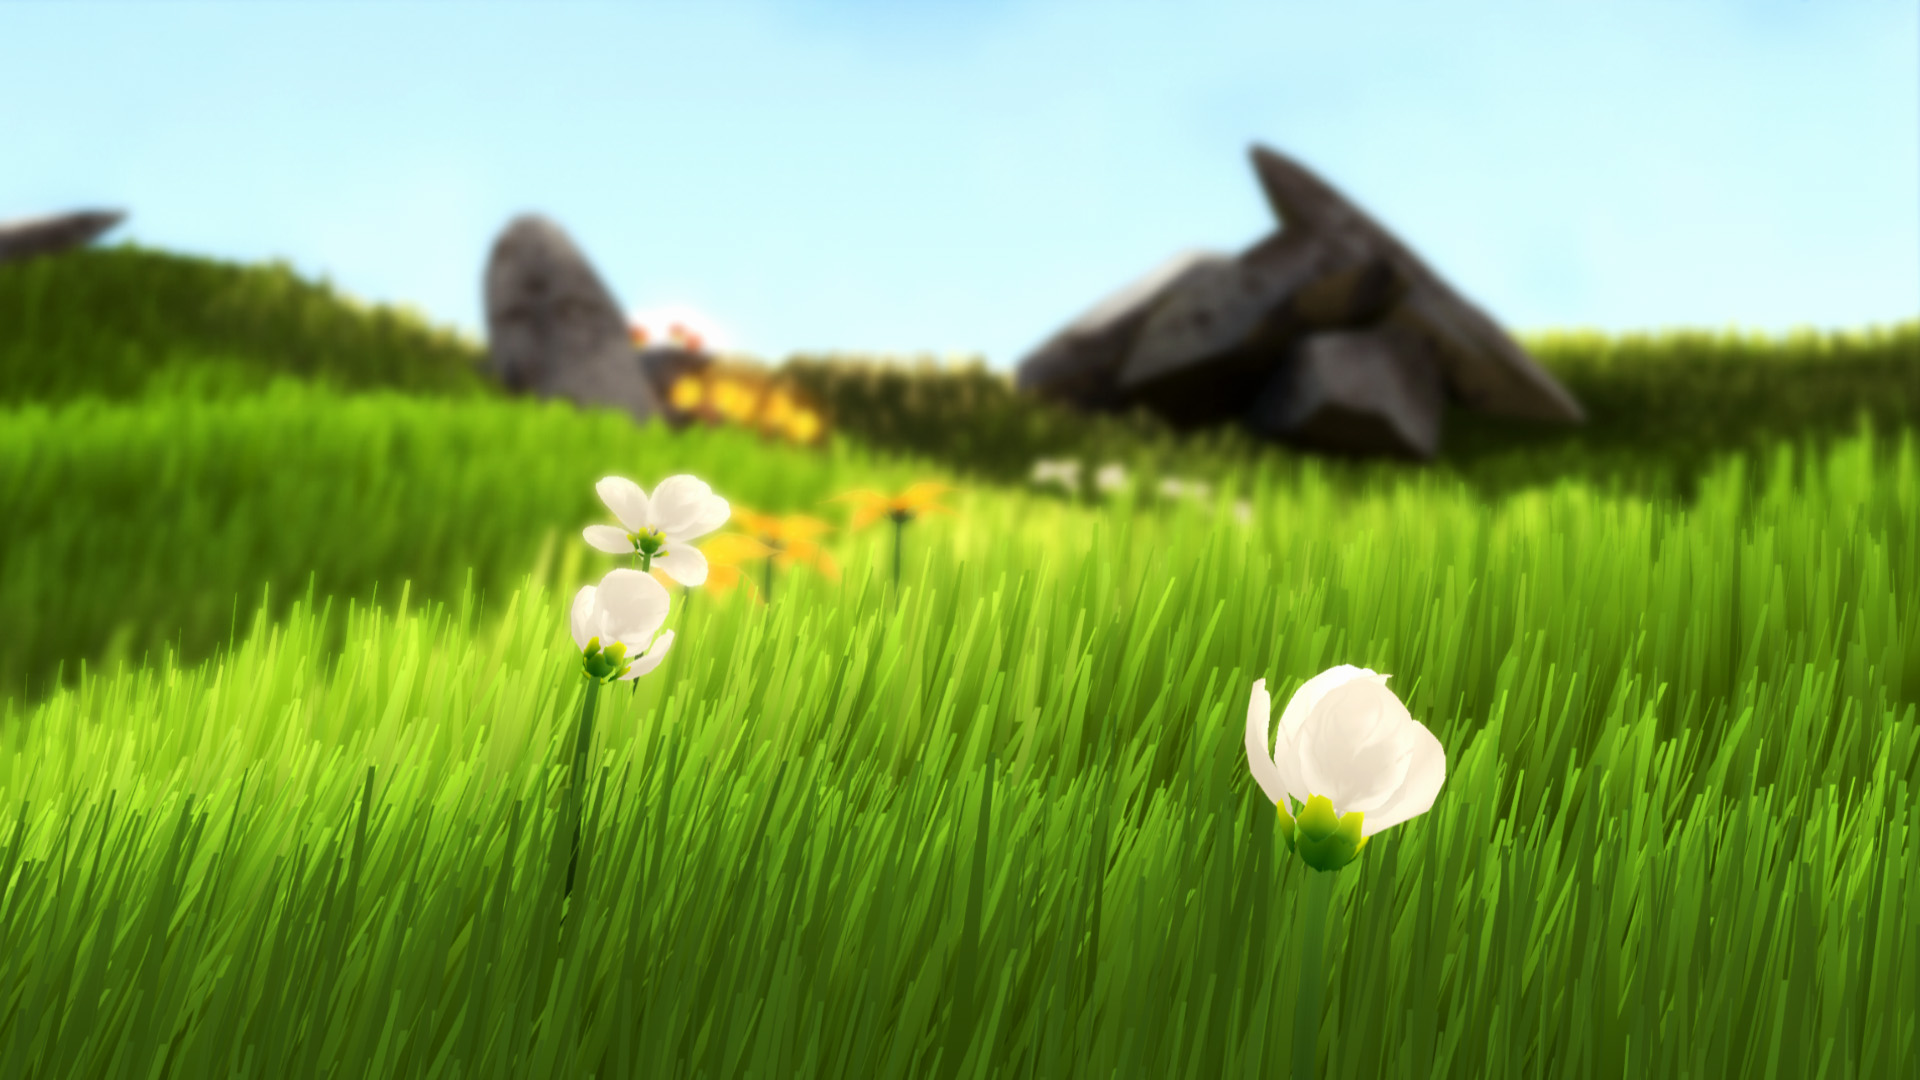 Game image Flower